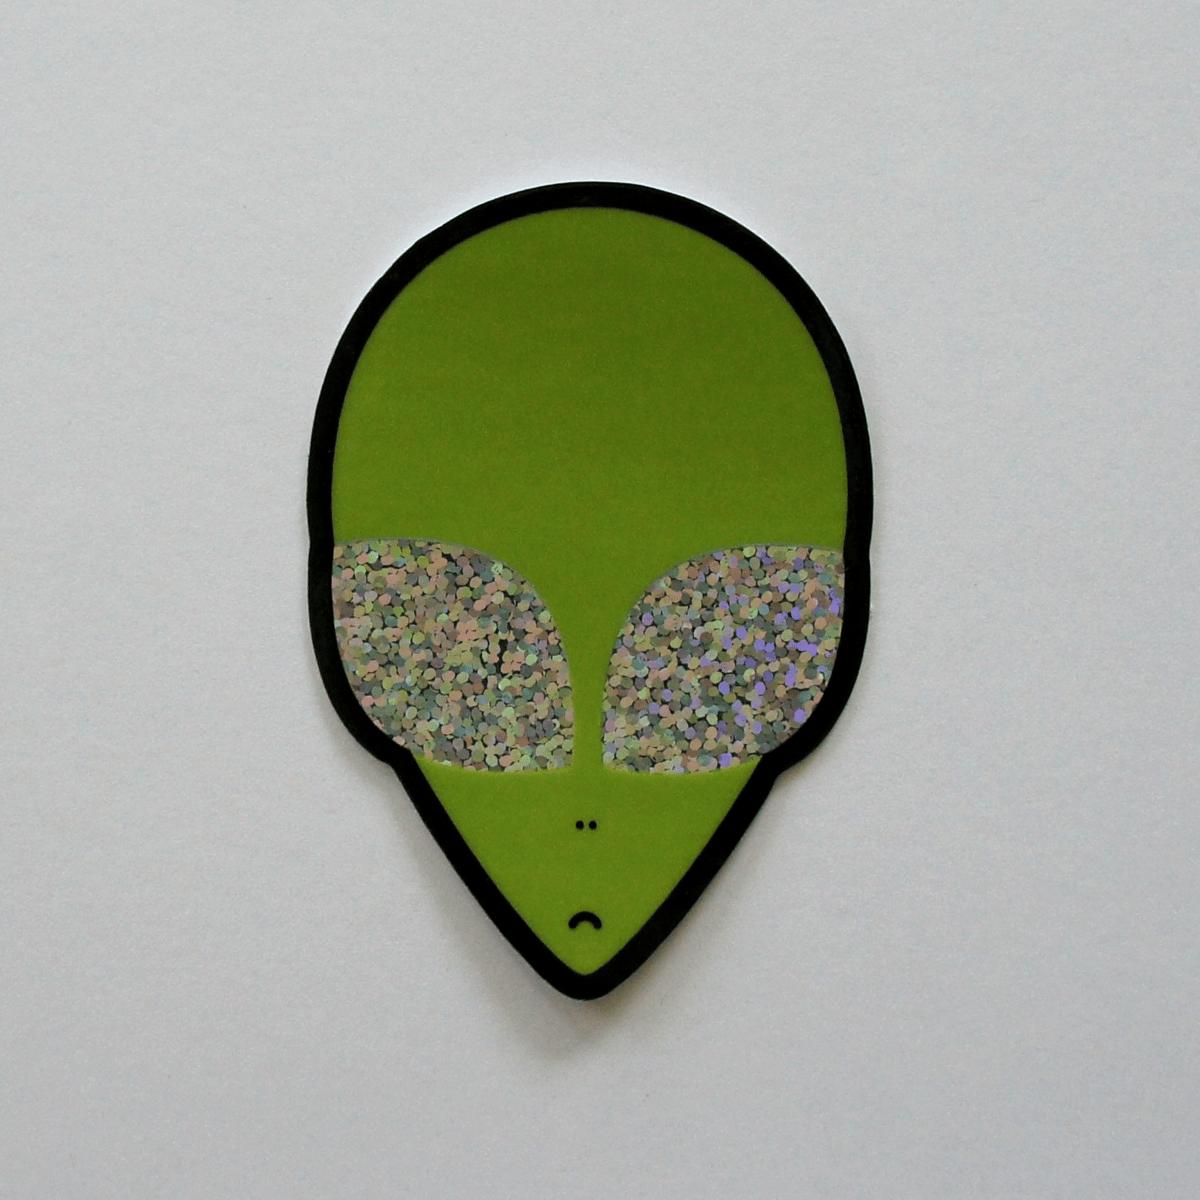 Holographic Glitter Alien Sticker